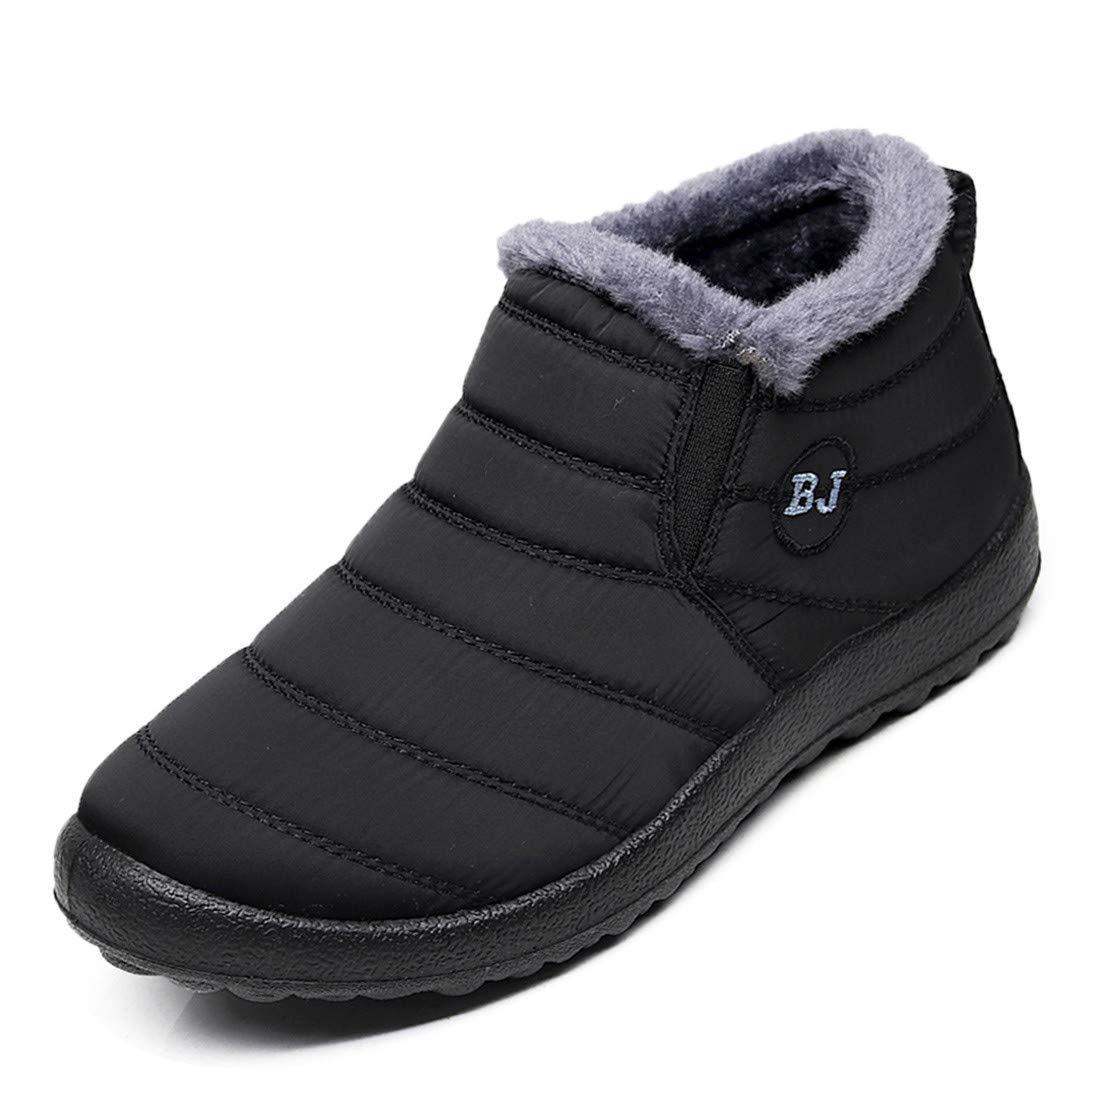 d2353b60cb836 HAVINA Womens Warm Snow Boots Outdoor Fur Lining Winter Shoes Anti-Slip  Lightweight Ankle Bootie